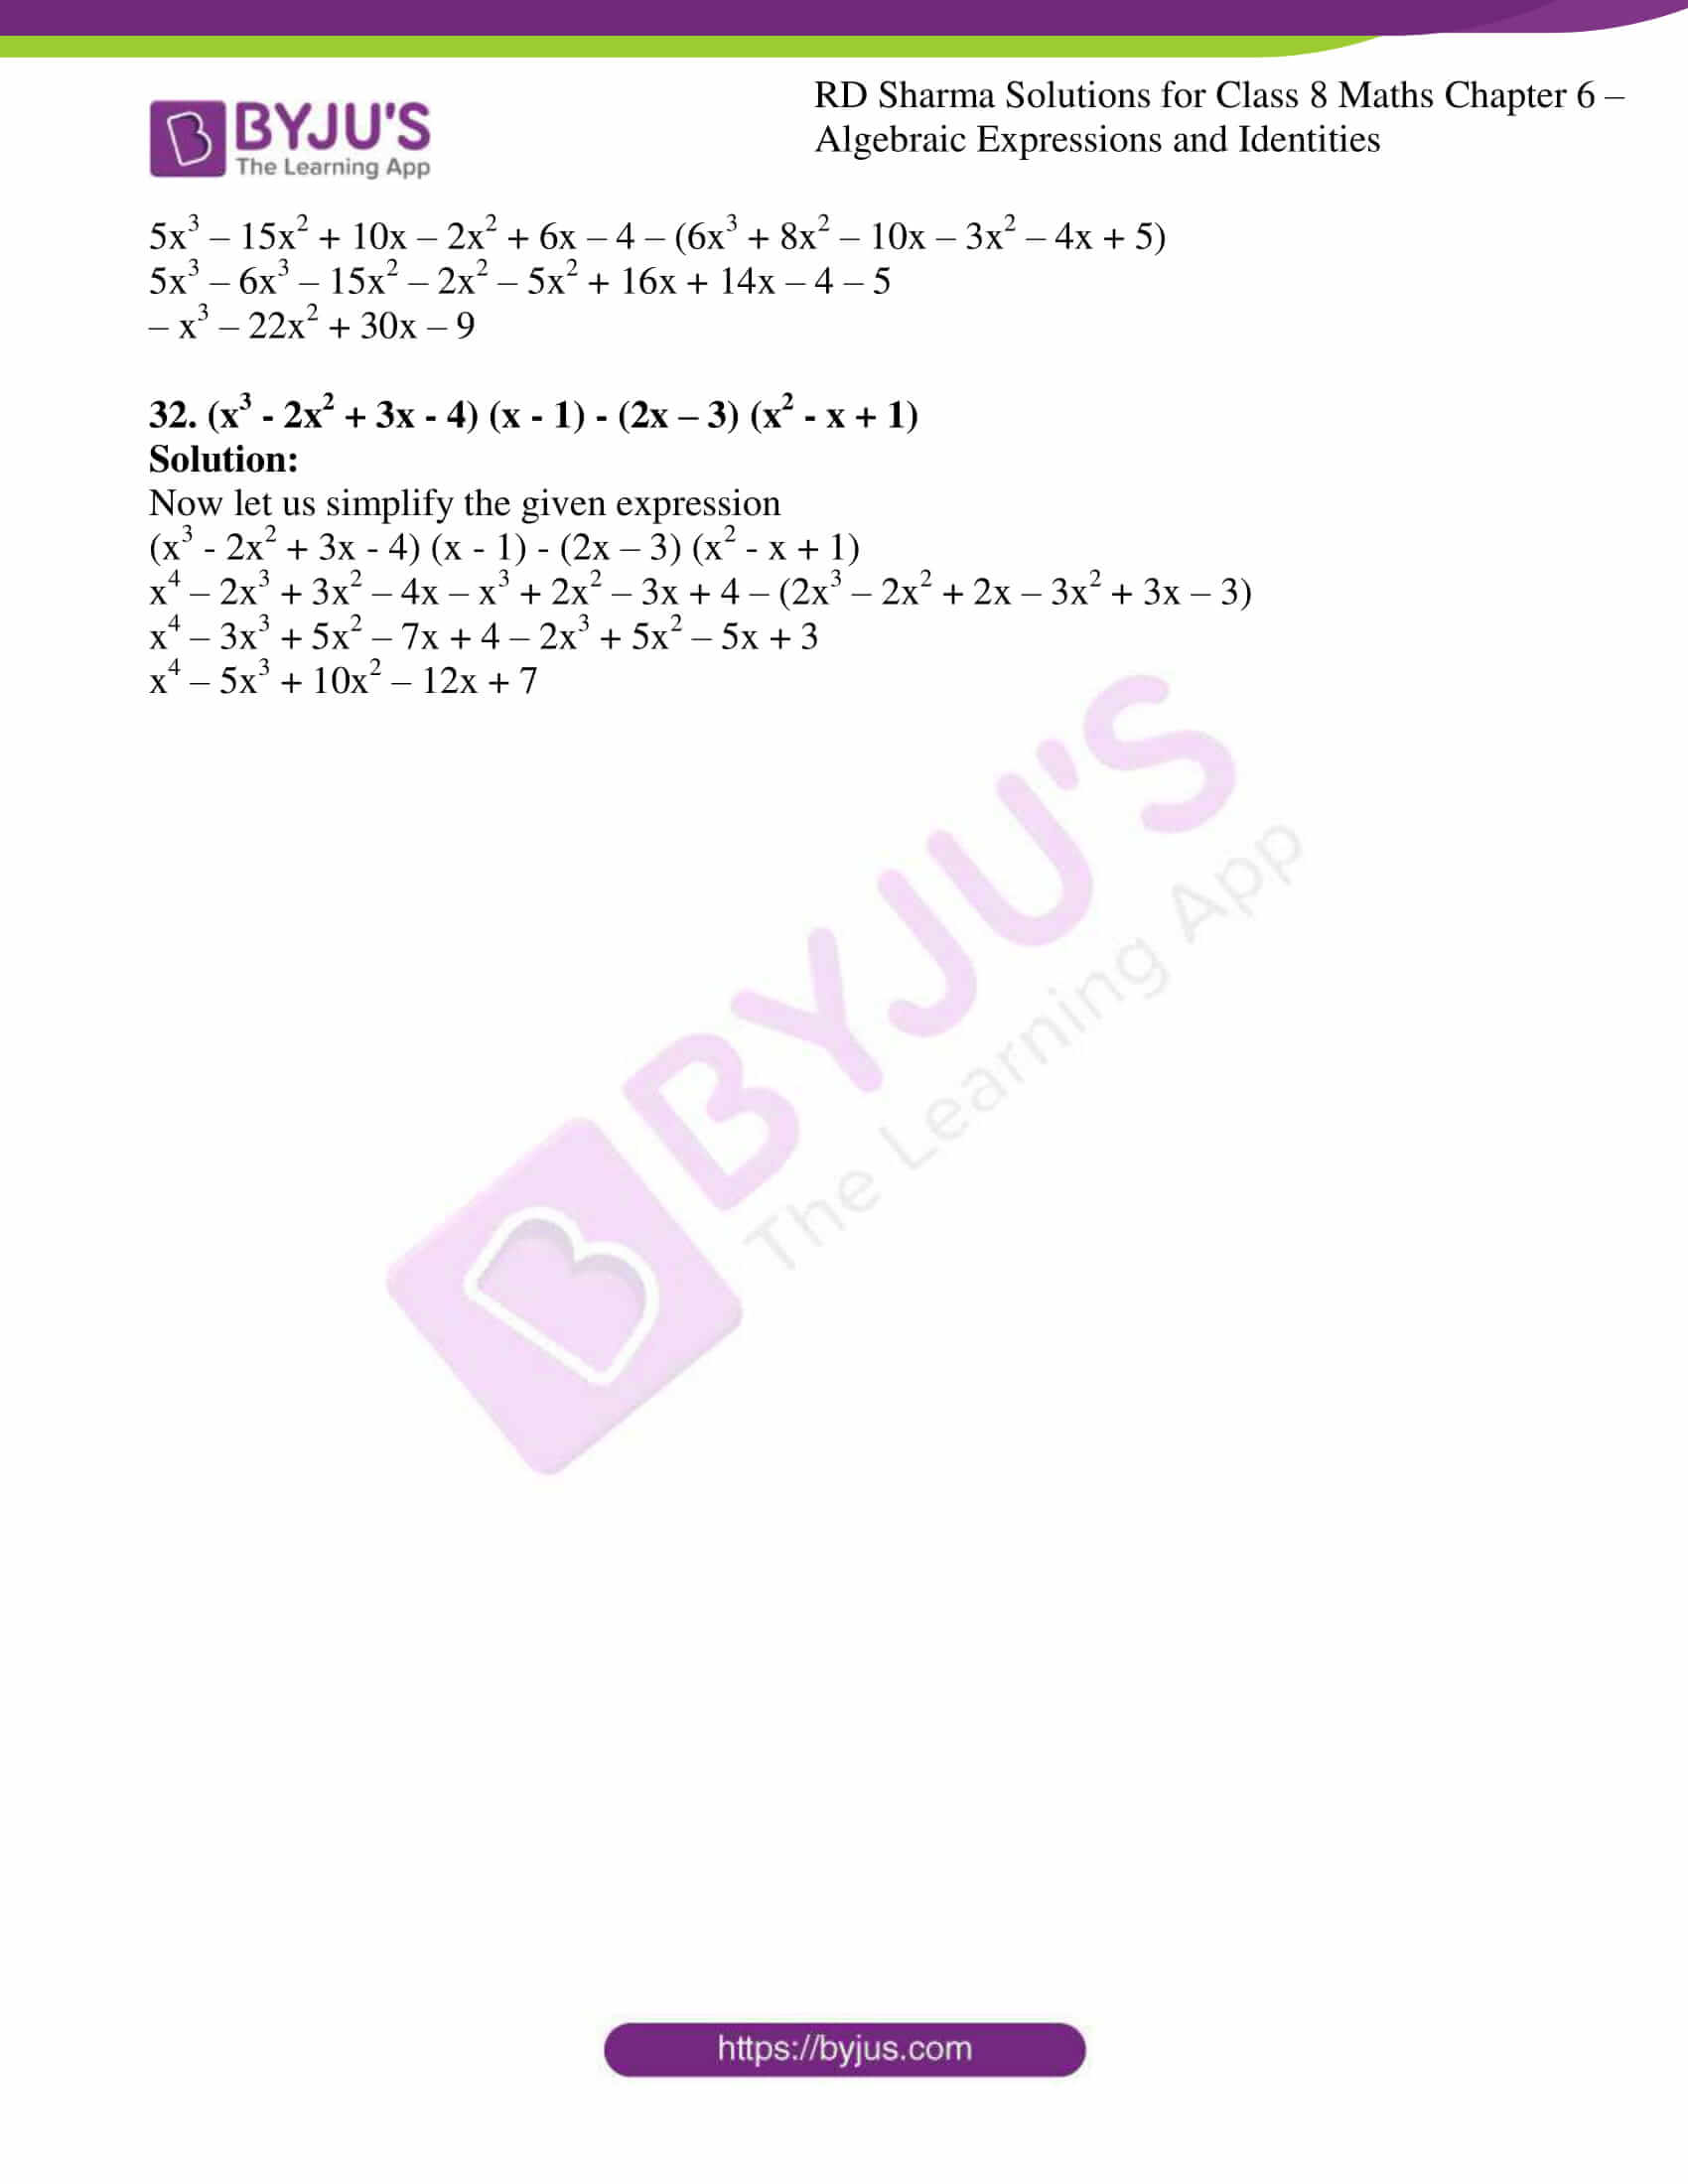 rd sharma class 8 maths chapter 6 exercise 5 8